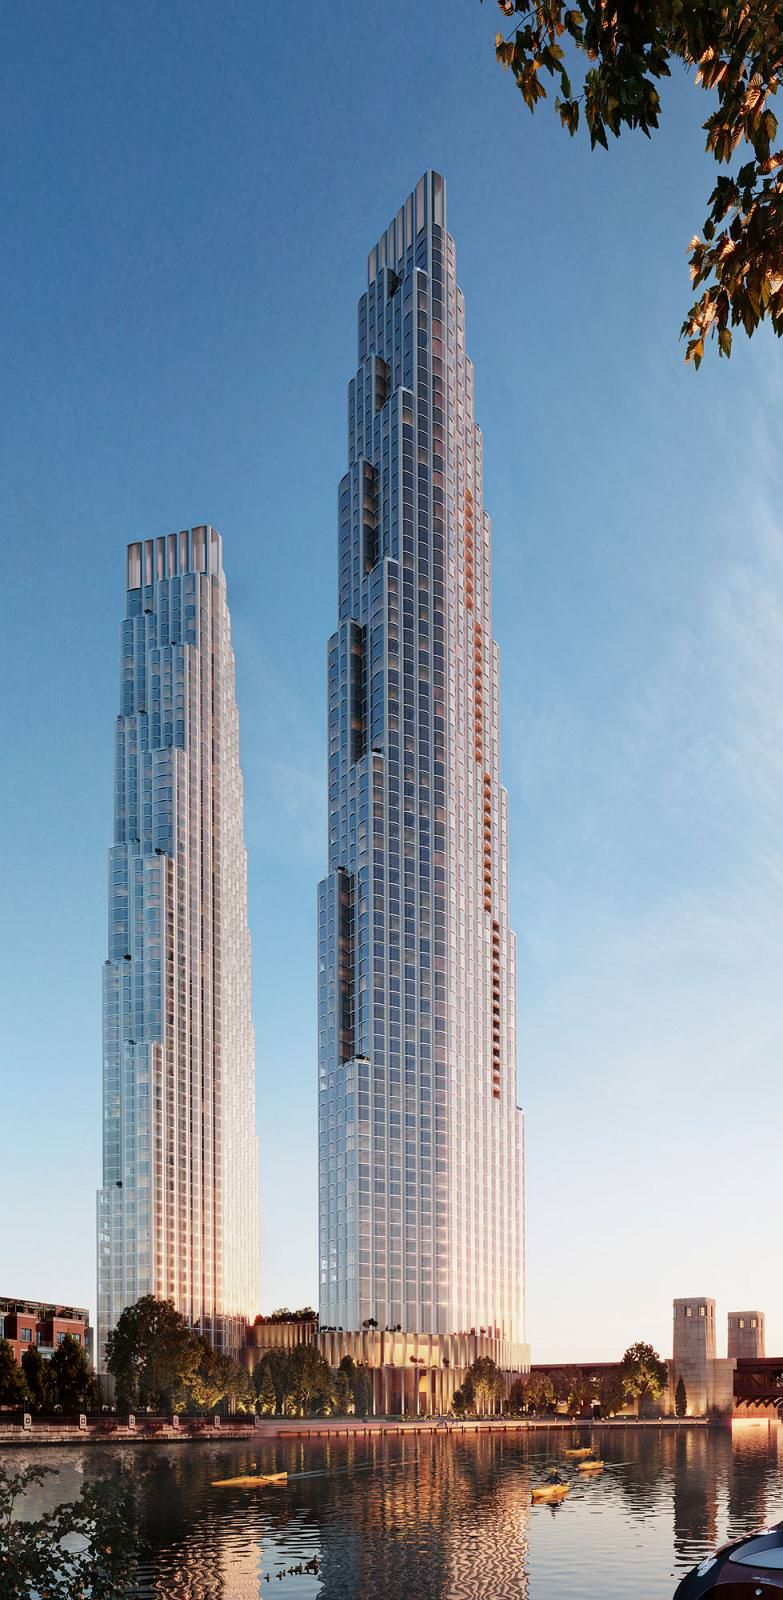 Chicago 400 Lake Shore Drive 1 100 Ft 850 Ft 76 65 Floors Skyscraperpage Forum Skyscraper Architecture Beautiful Buildings Future Buildings